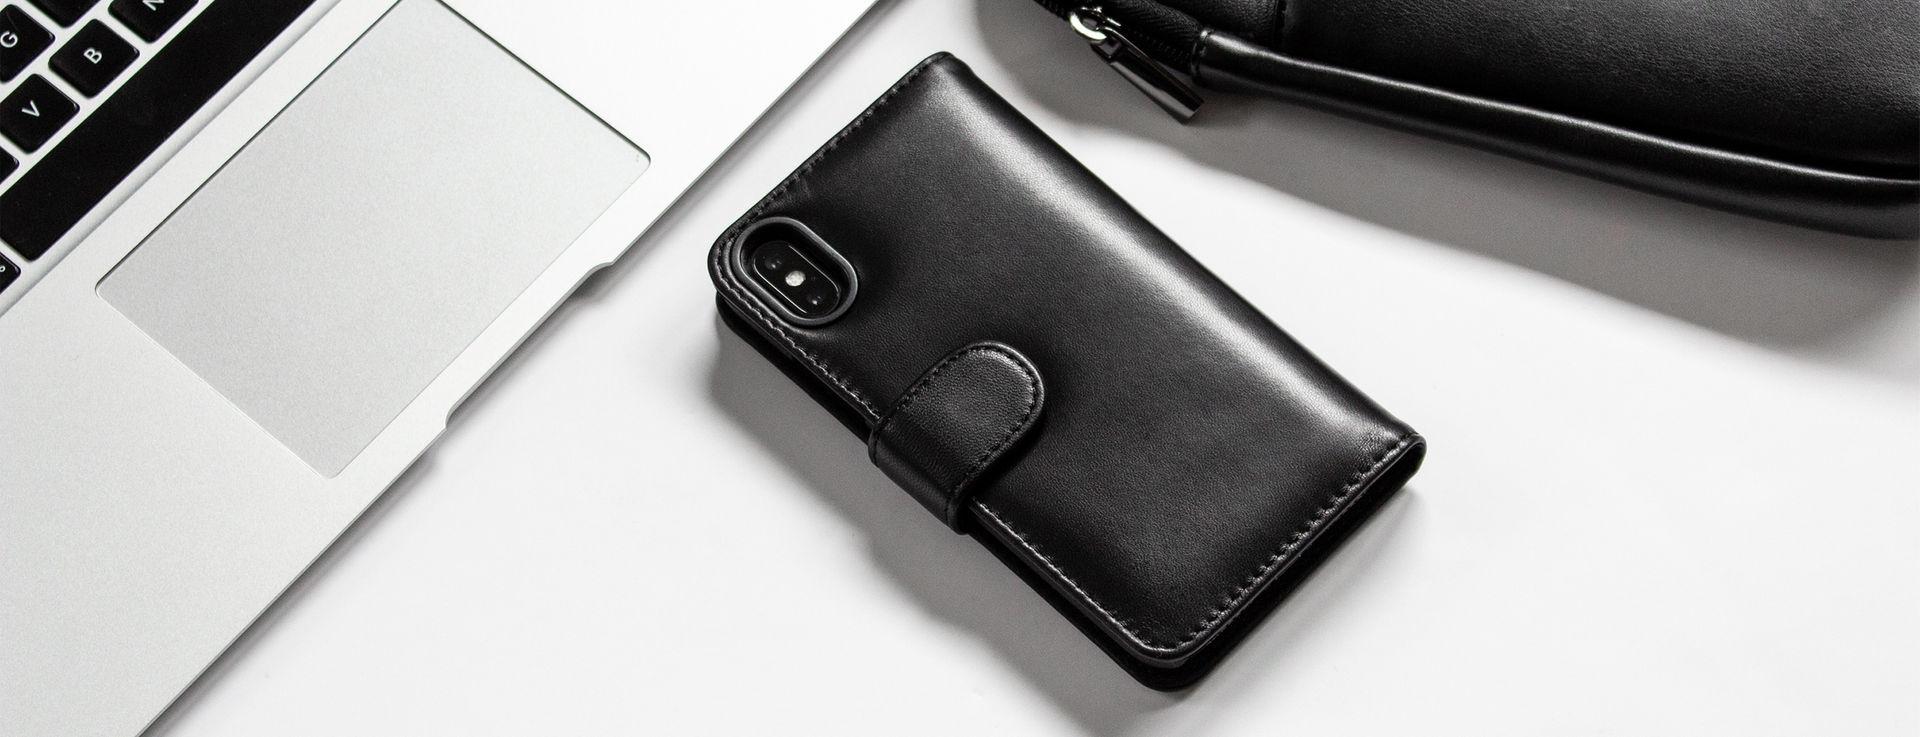 SeeJacket Leather Lifestyle